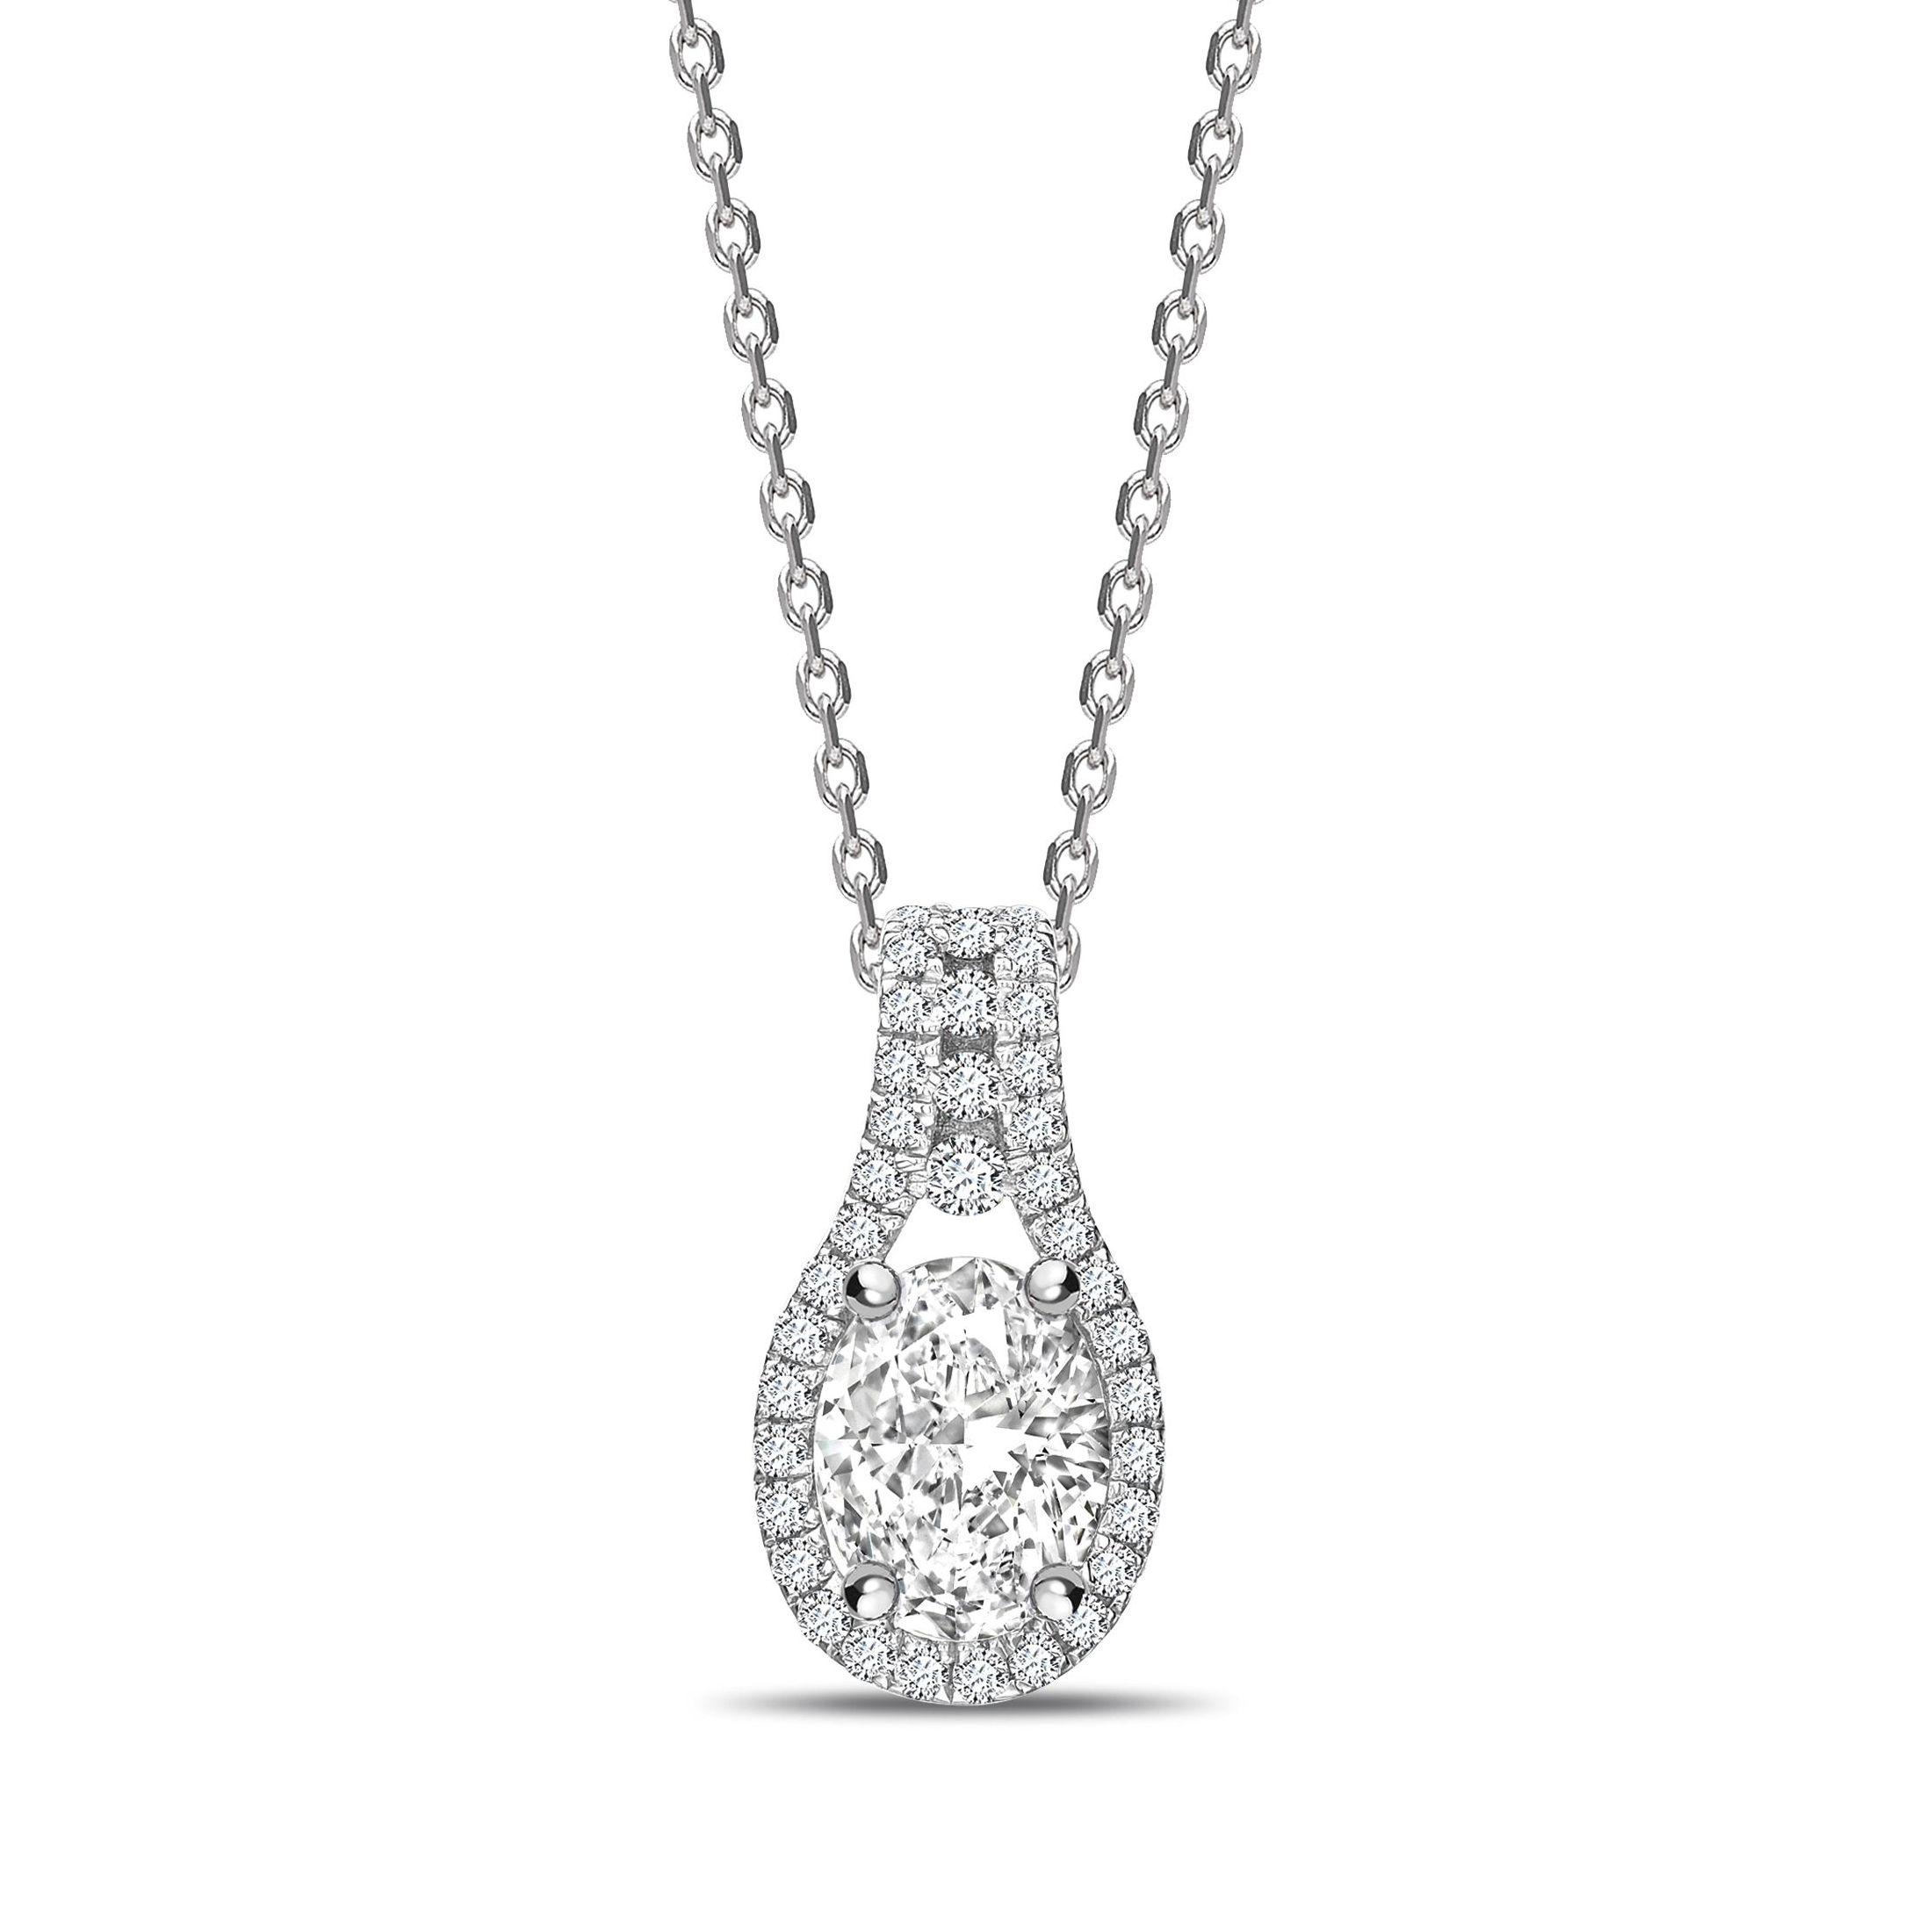 Designer Halo Oval Shape Halo Diamond Necklace